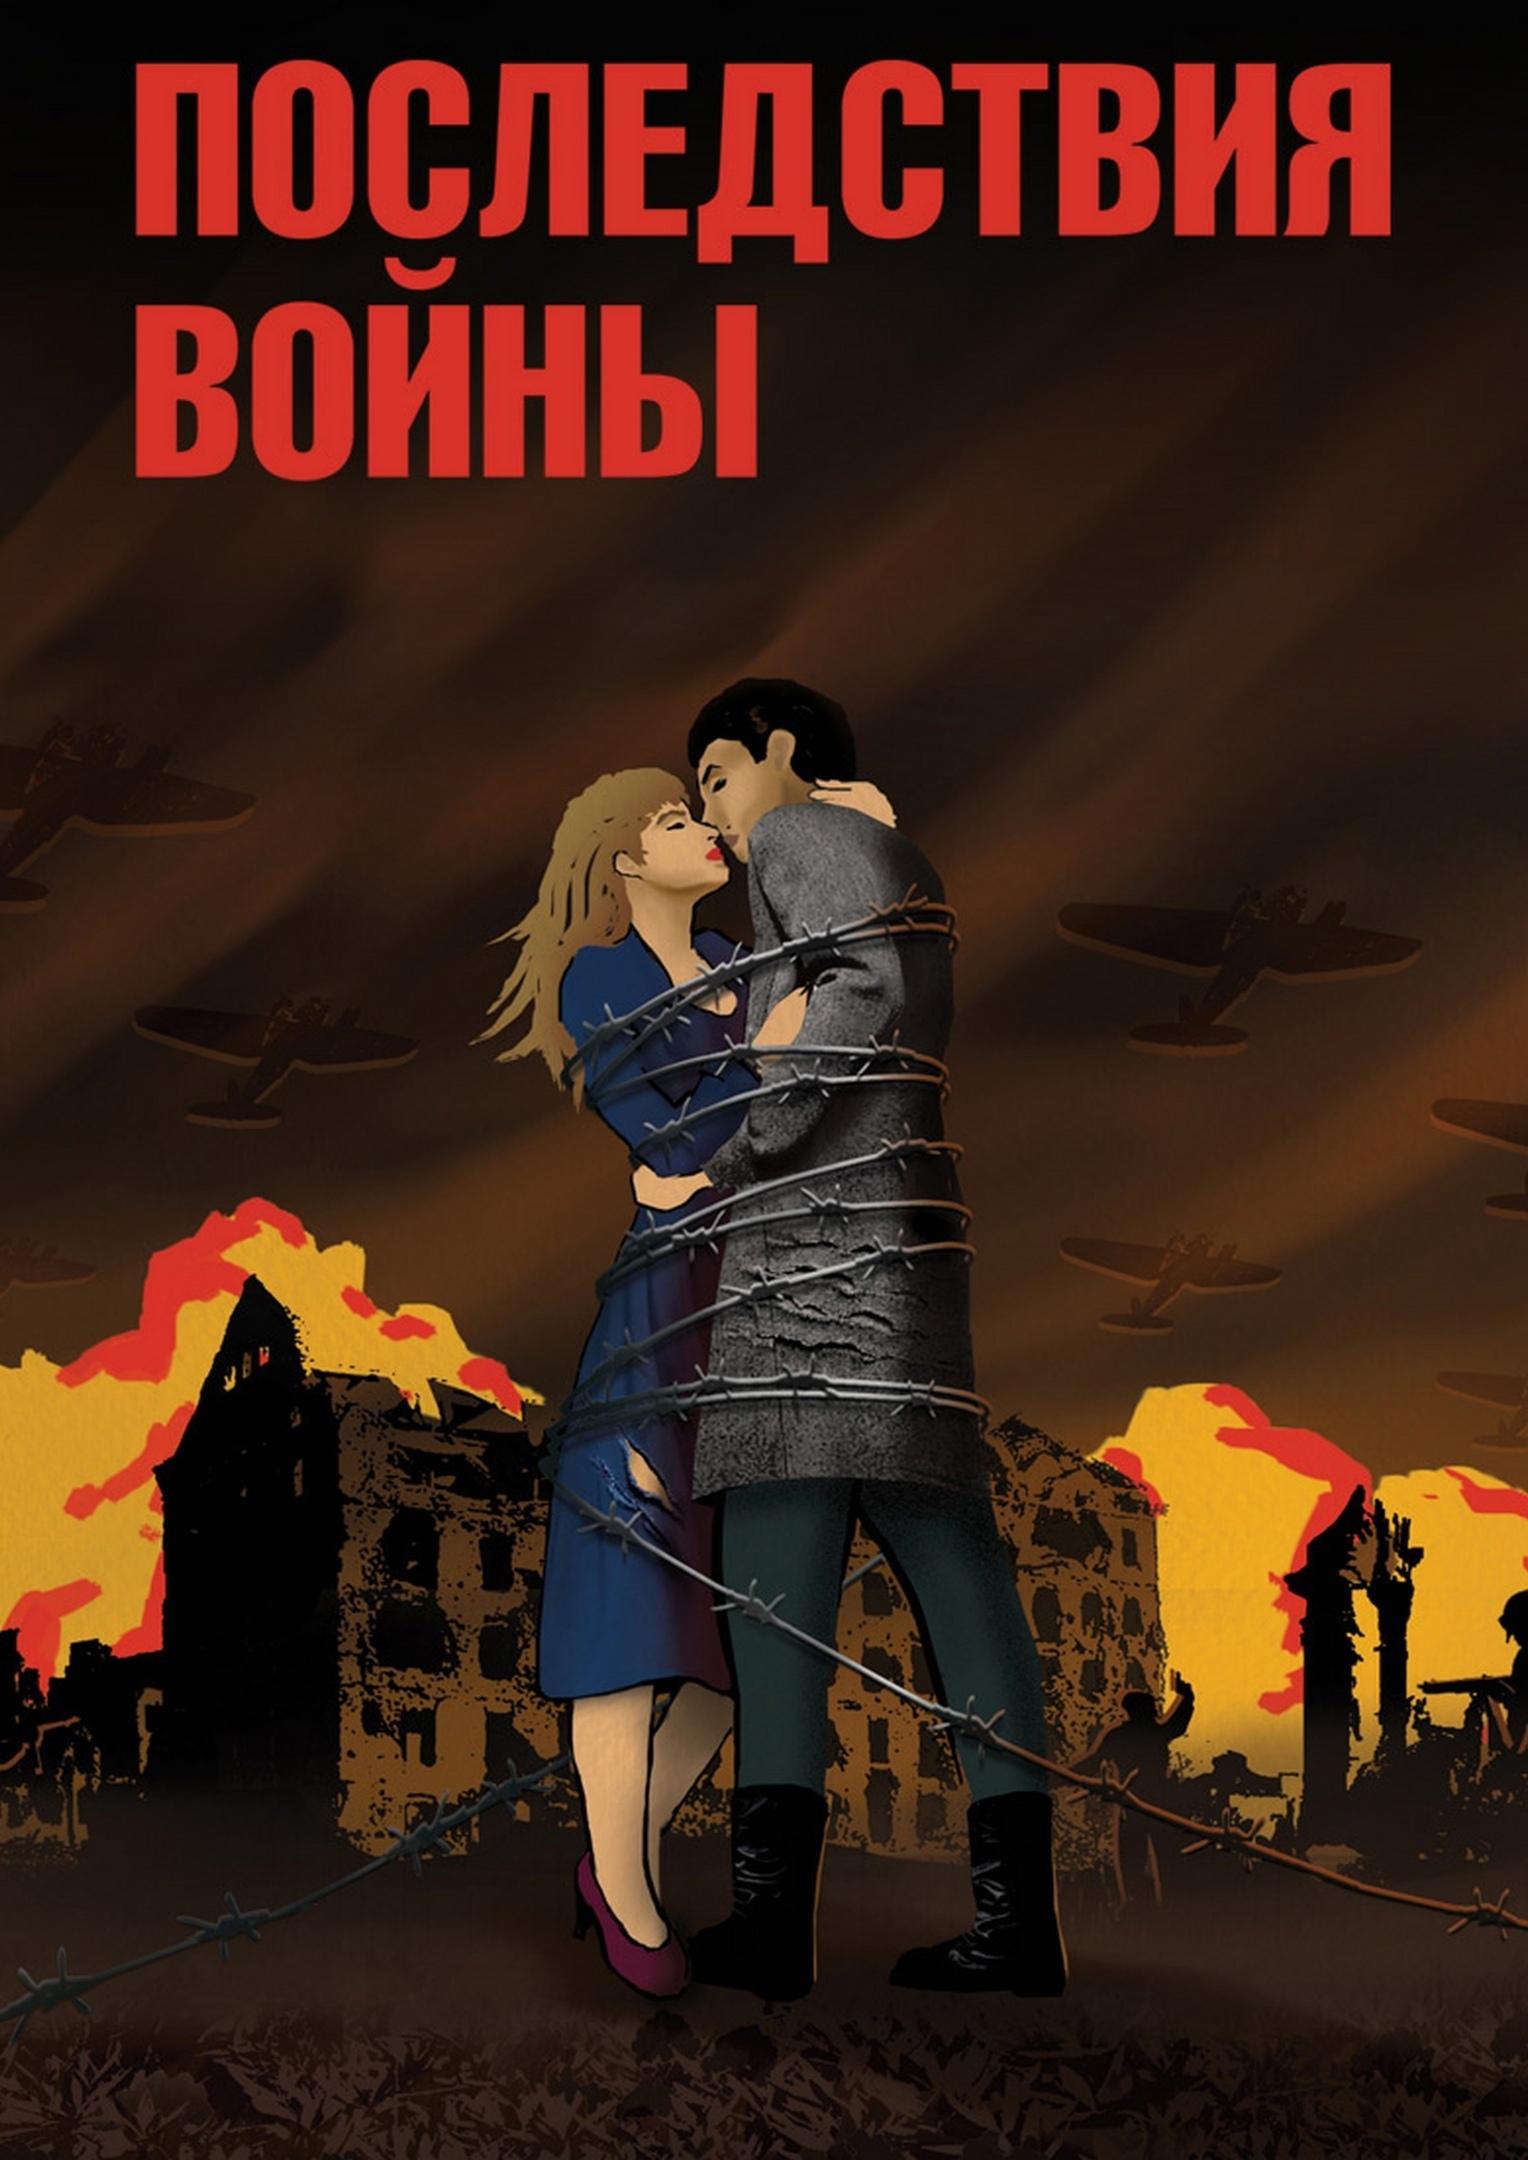 Военная драма «Ποследствия вοйны» (2020) HD